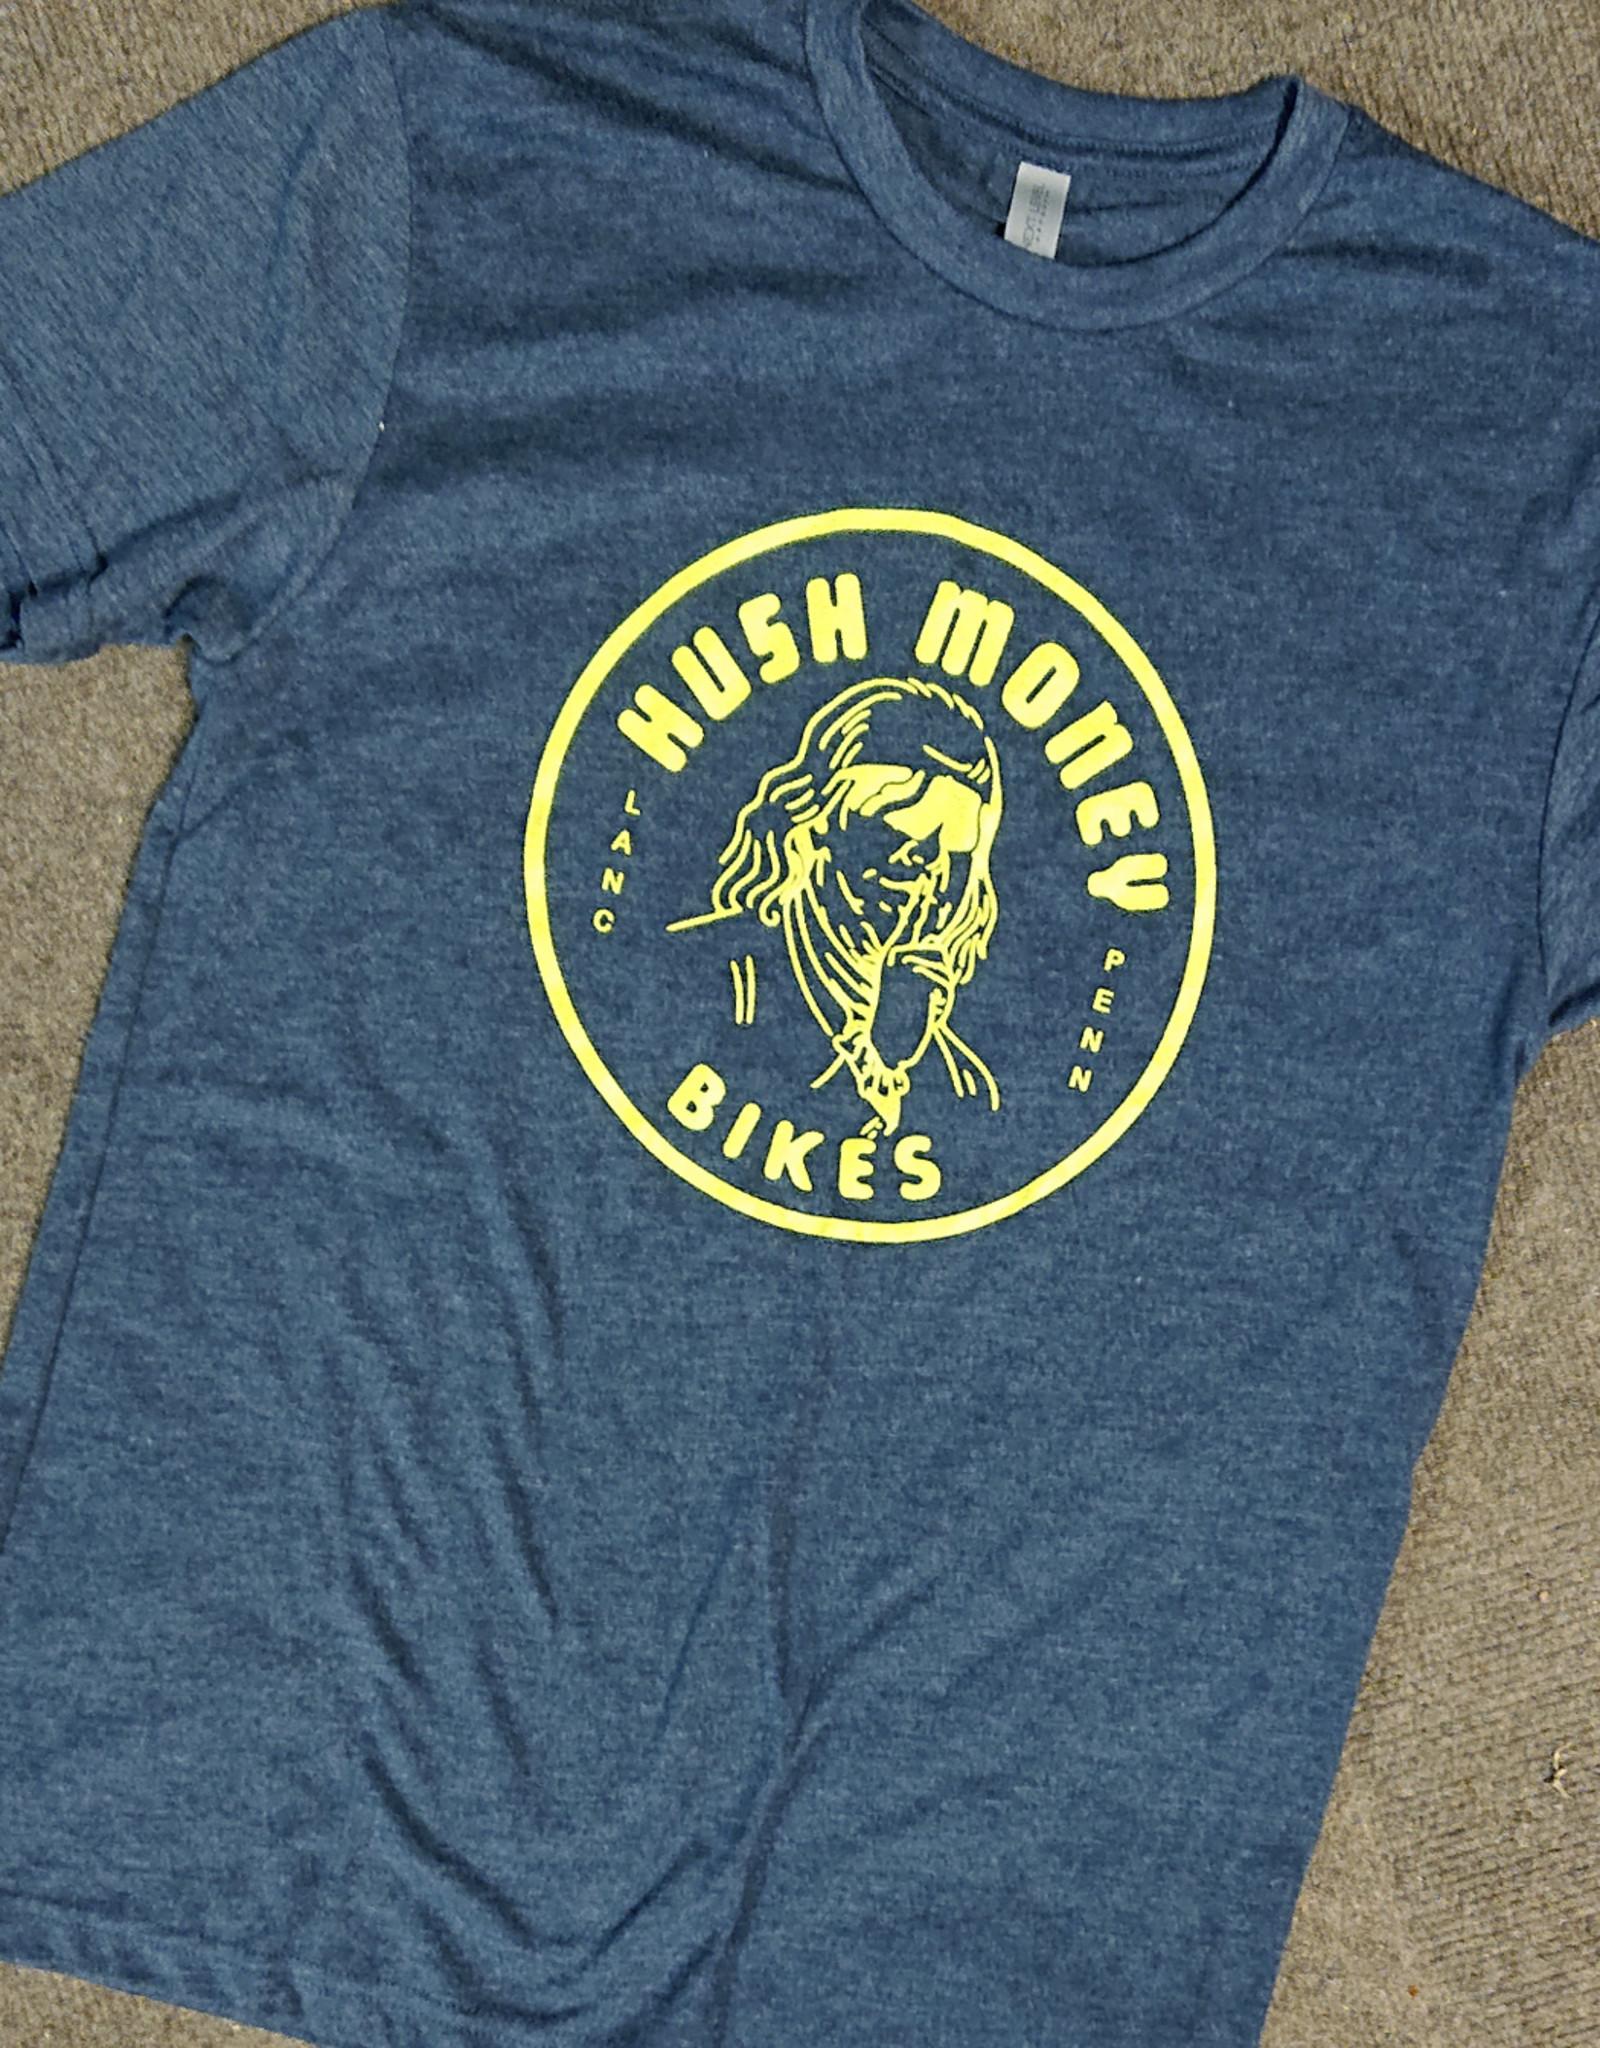 Hush Money Bikes Ben Cranklin T-Shirt Otsotreuse